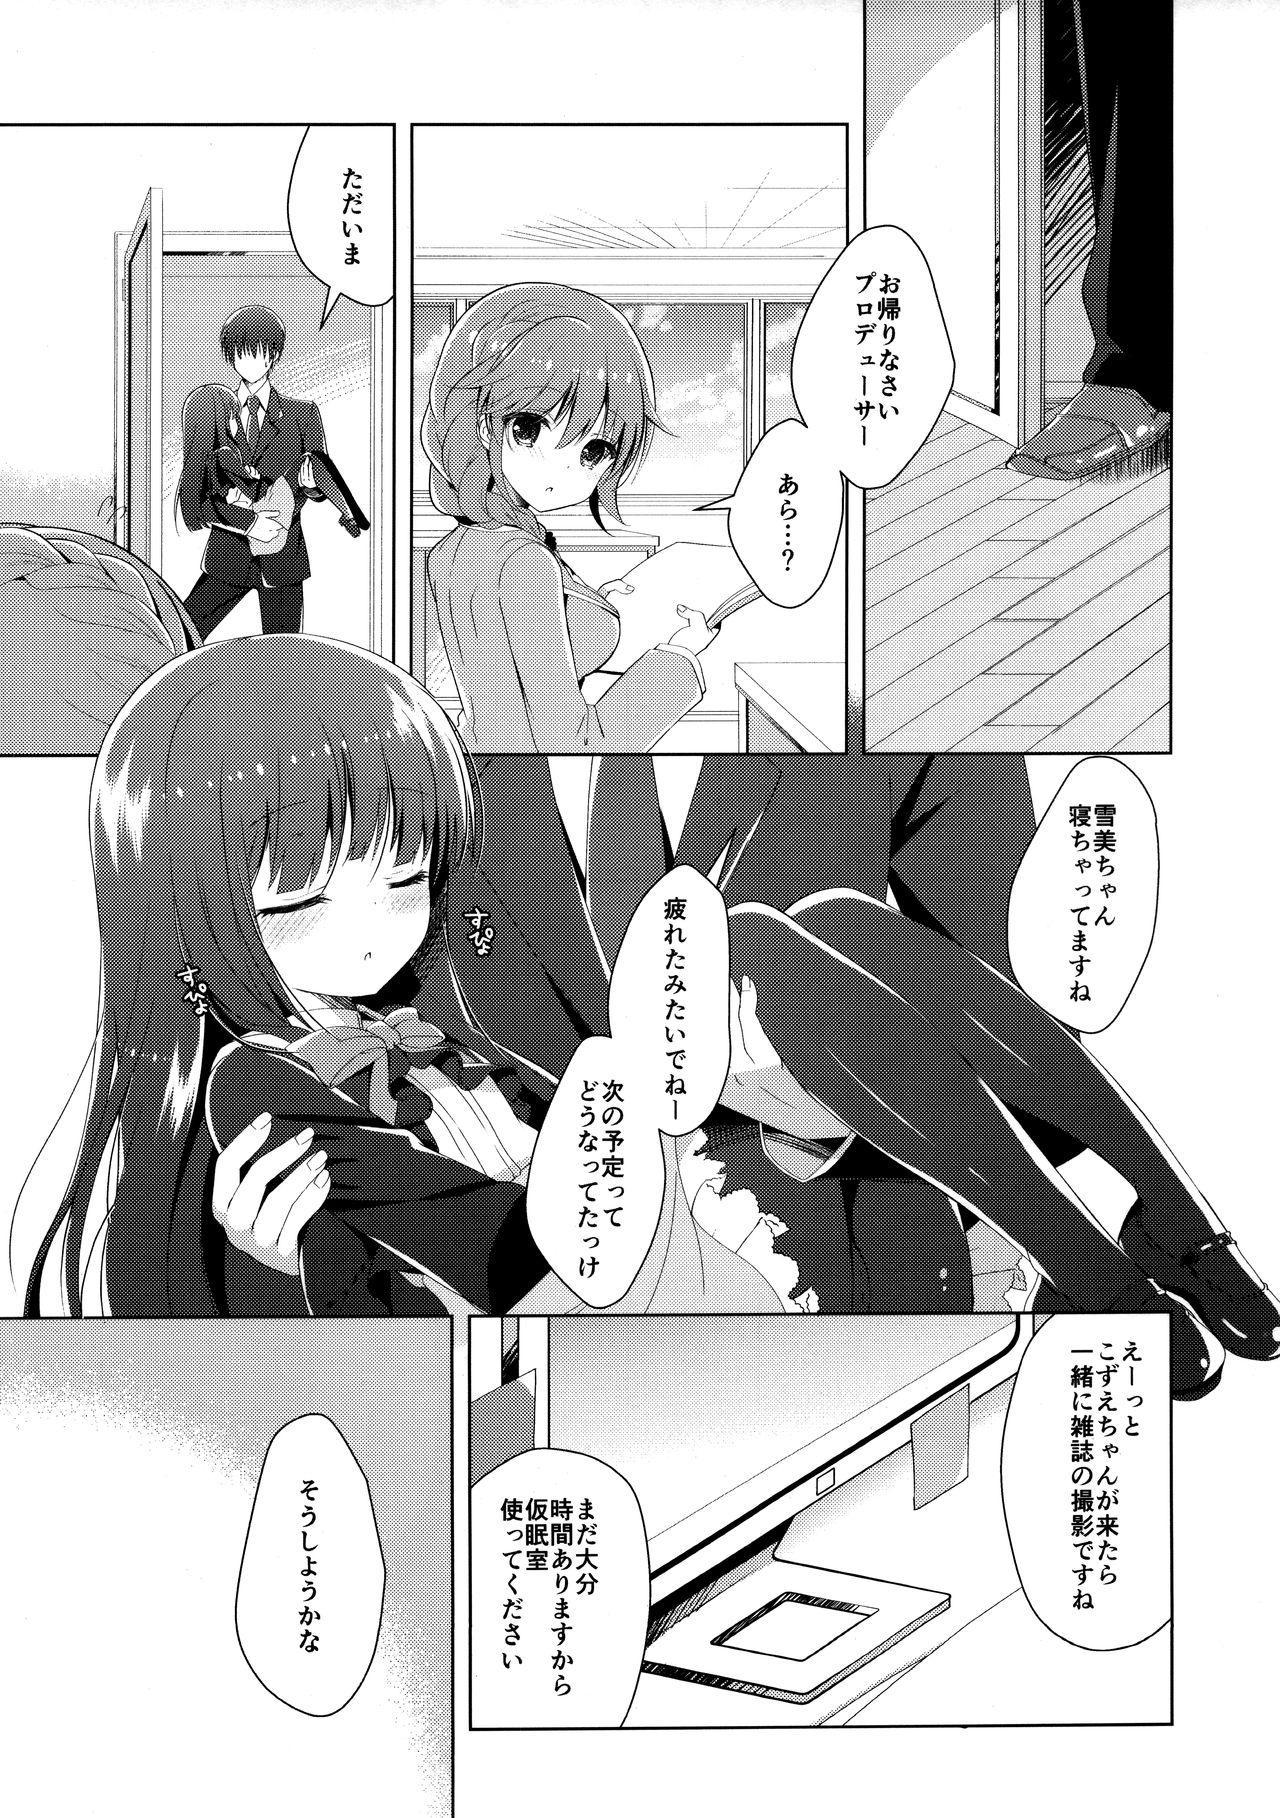 Yukimi to Kozue to Issho ni Onemu 3